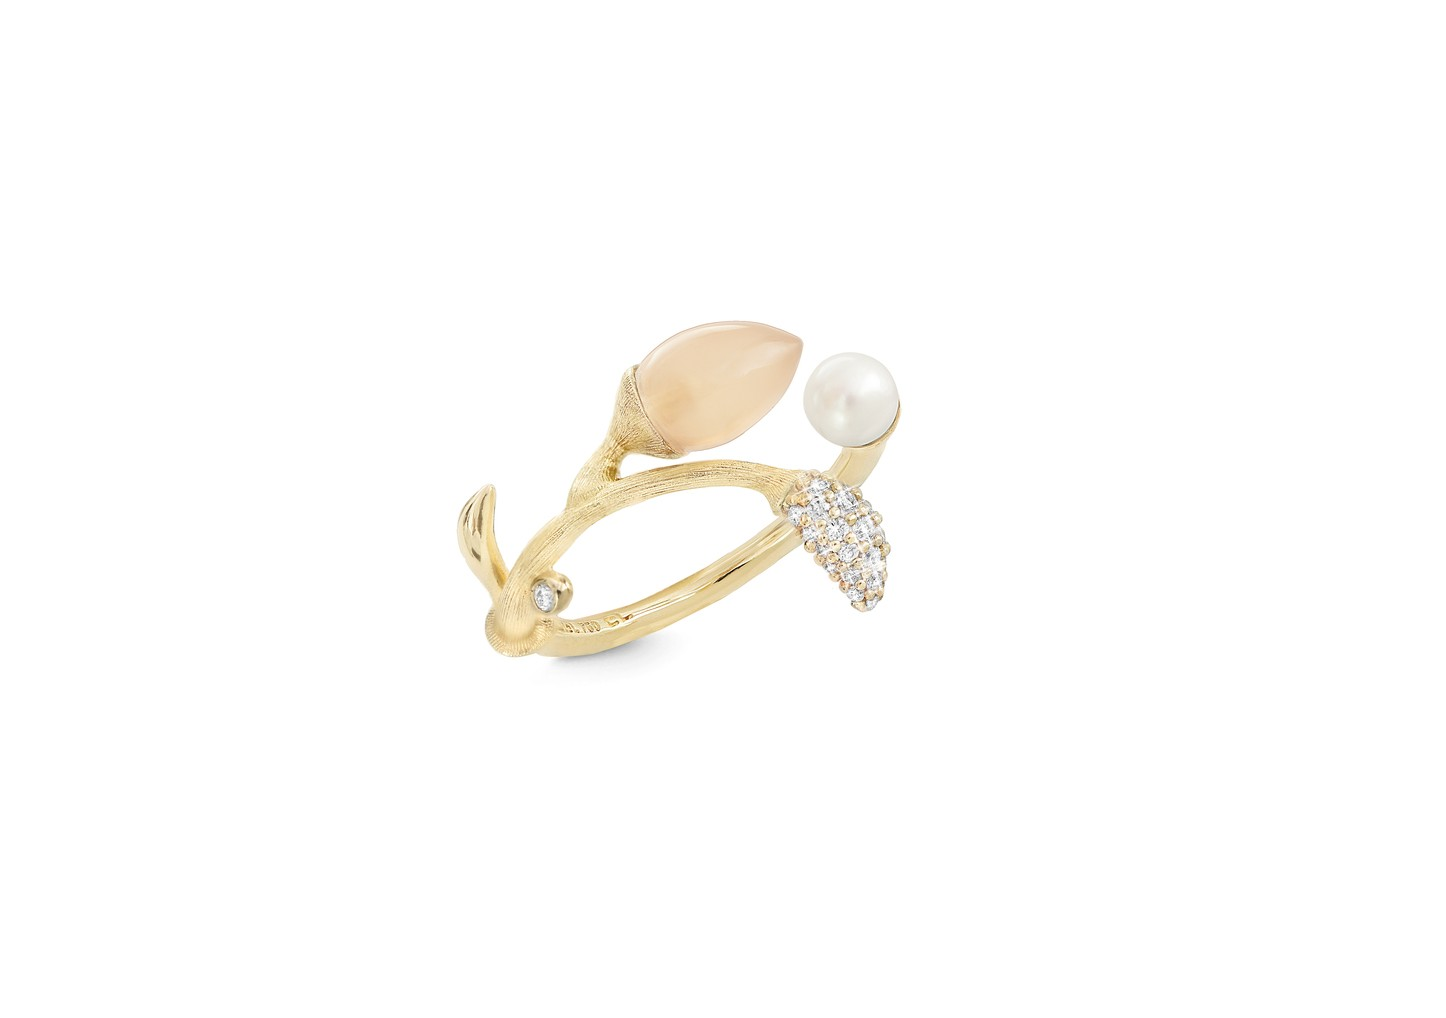 Ring Blooming Blush Mondstein - Ole Lynggaard - A2884-402